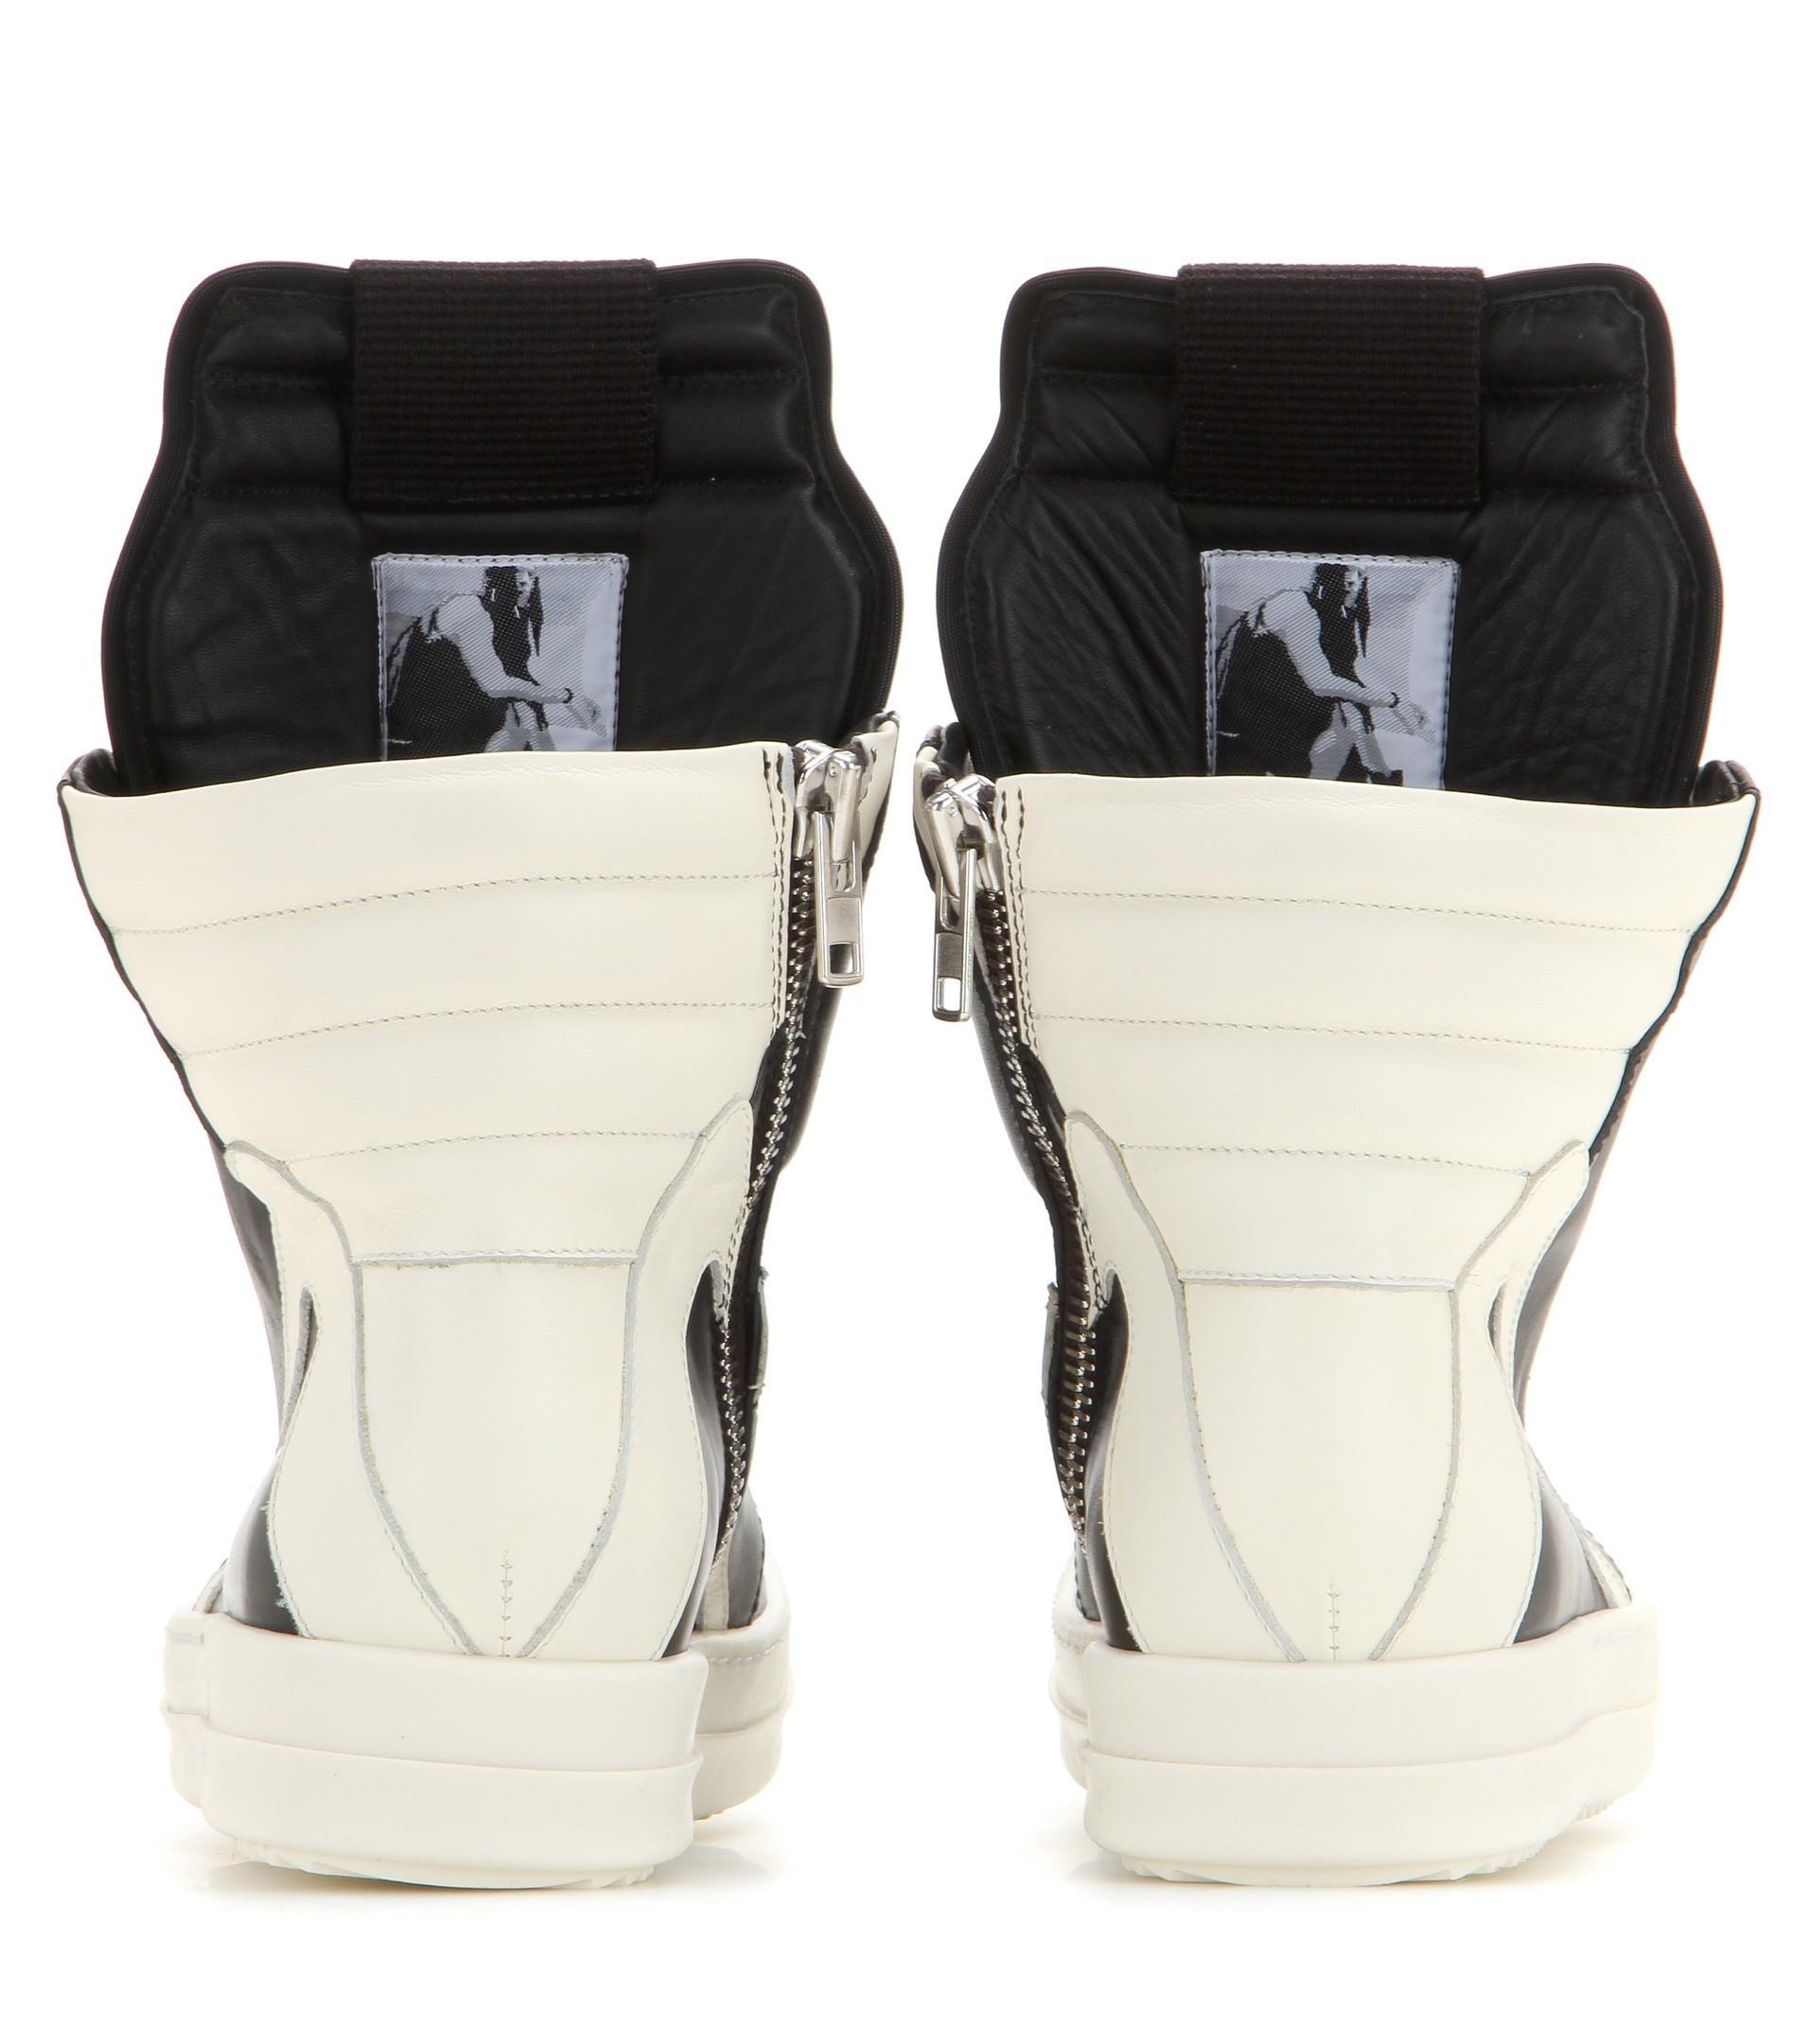 Lyst - Rick Owens Geobasket Leather High-top Sneakers in Blue